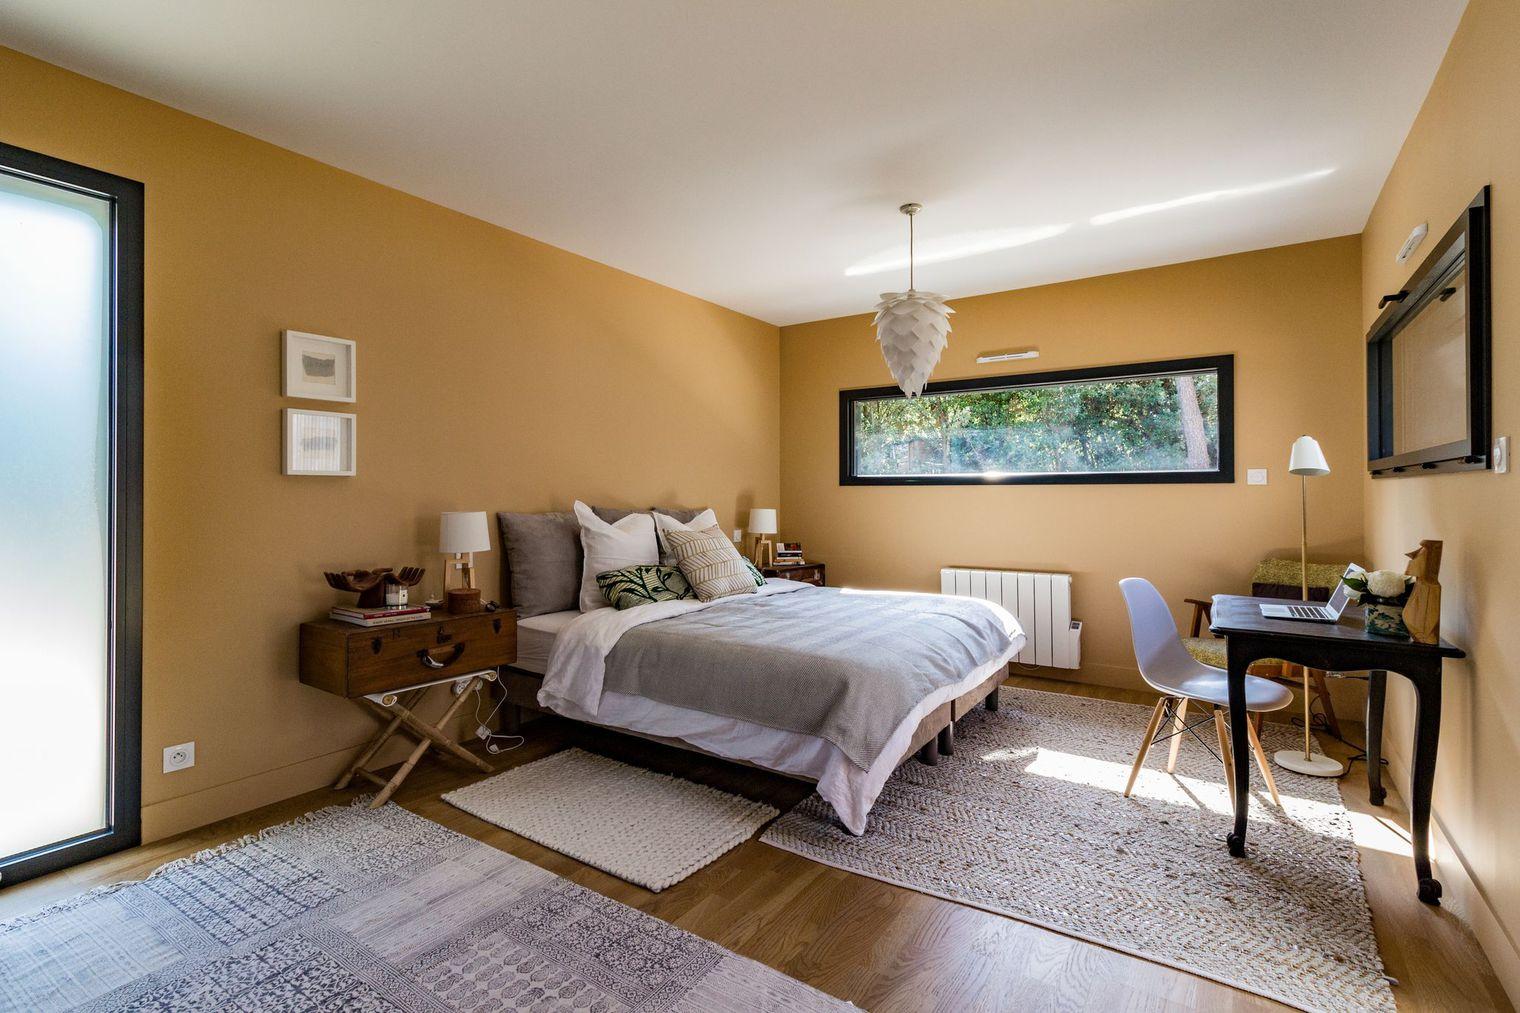 Gele Muur Slaapkamer : Ruime lichte slaapkamer van caroline en ryan slaapkamer ideeën